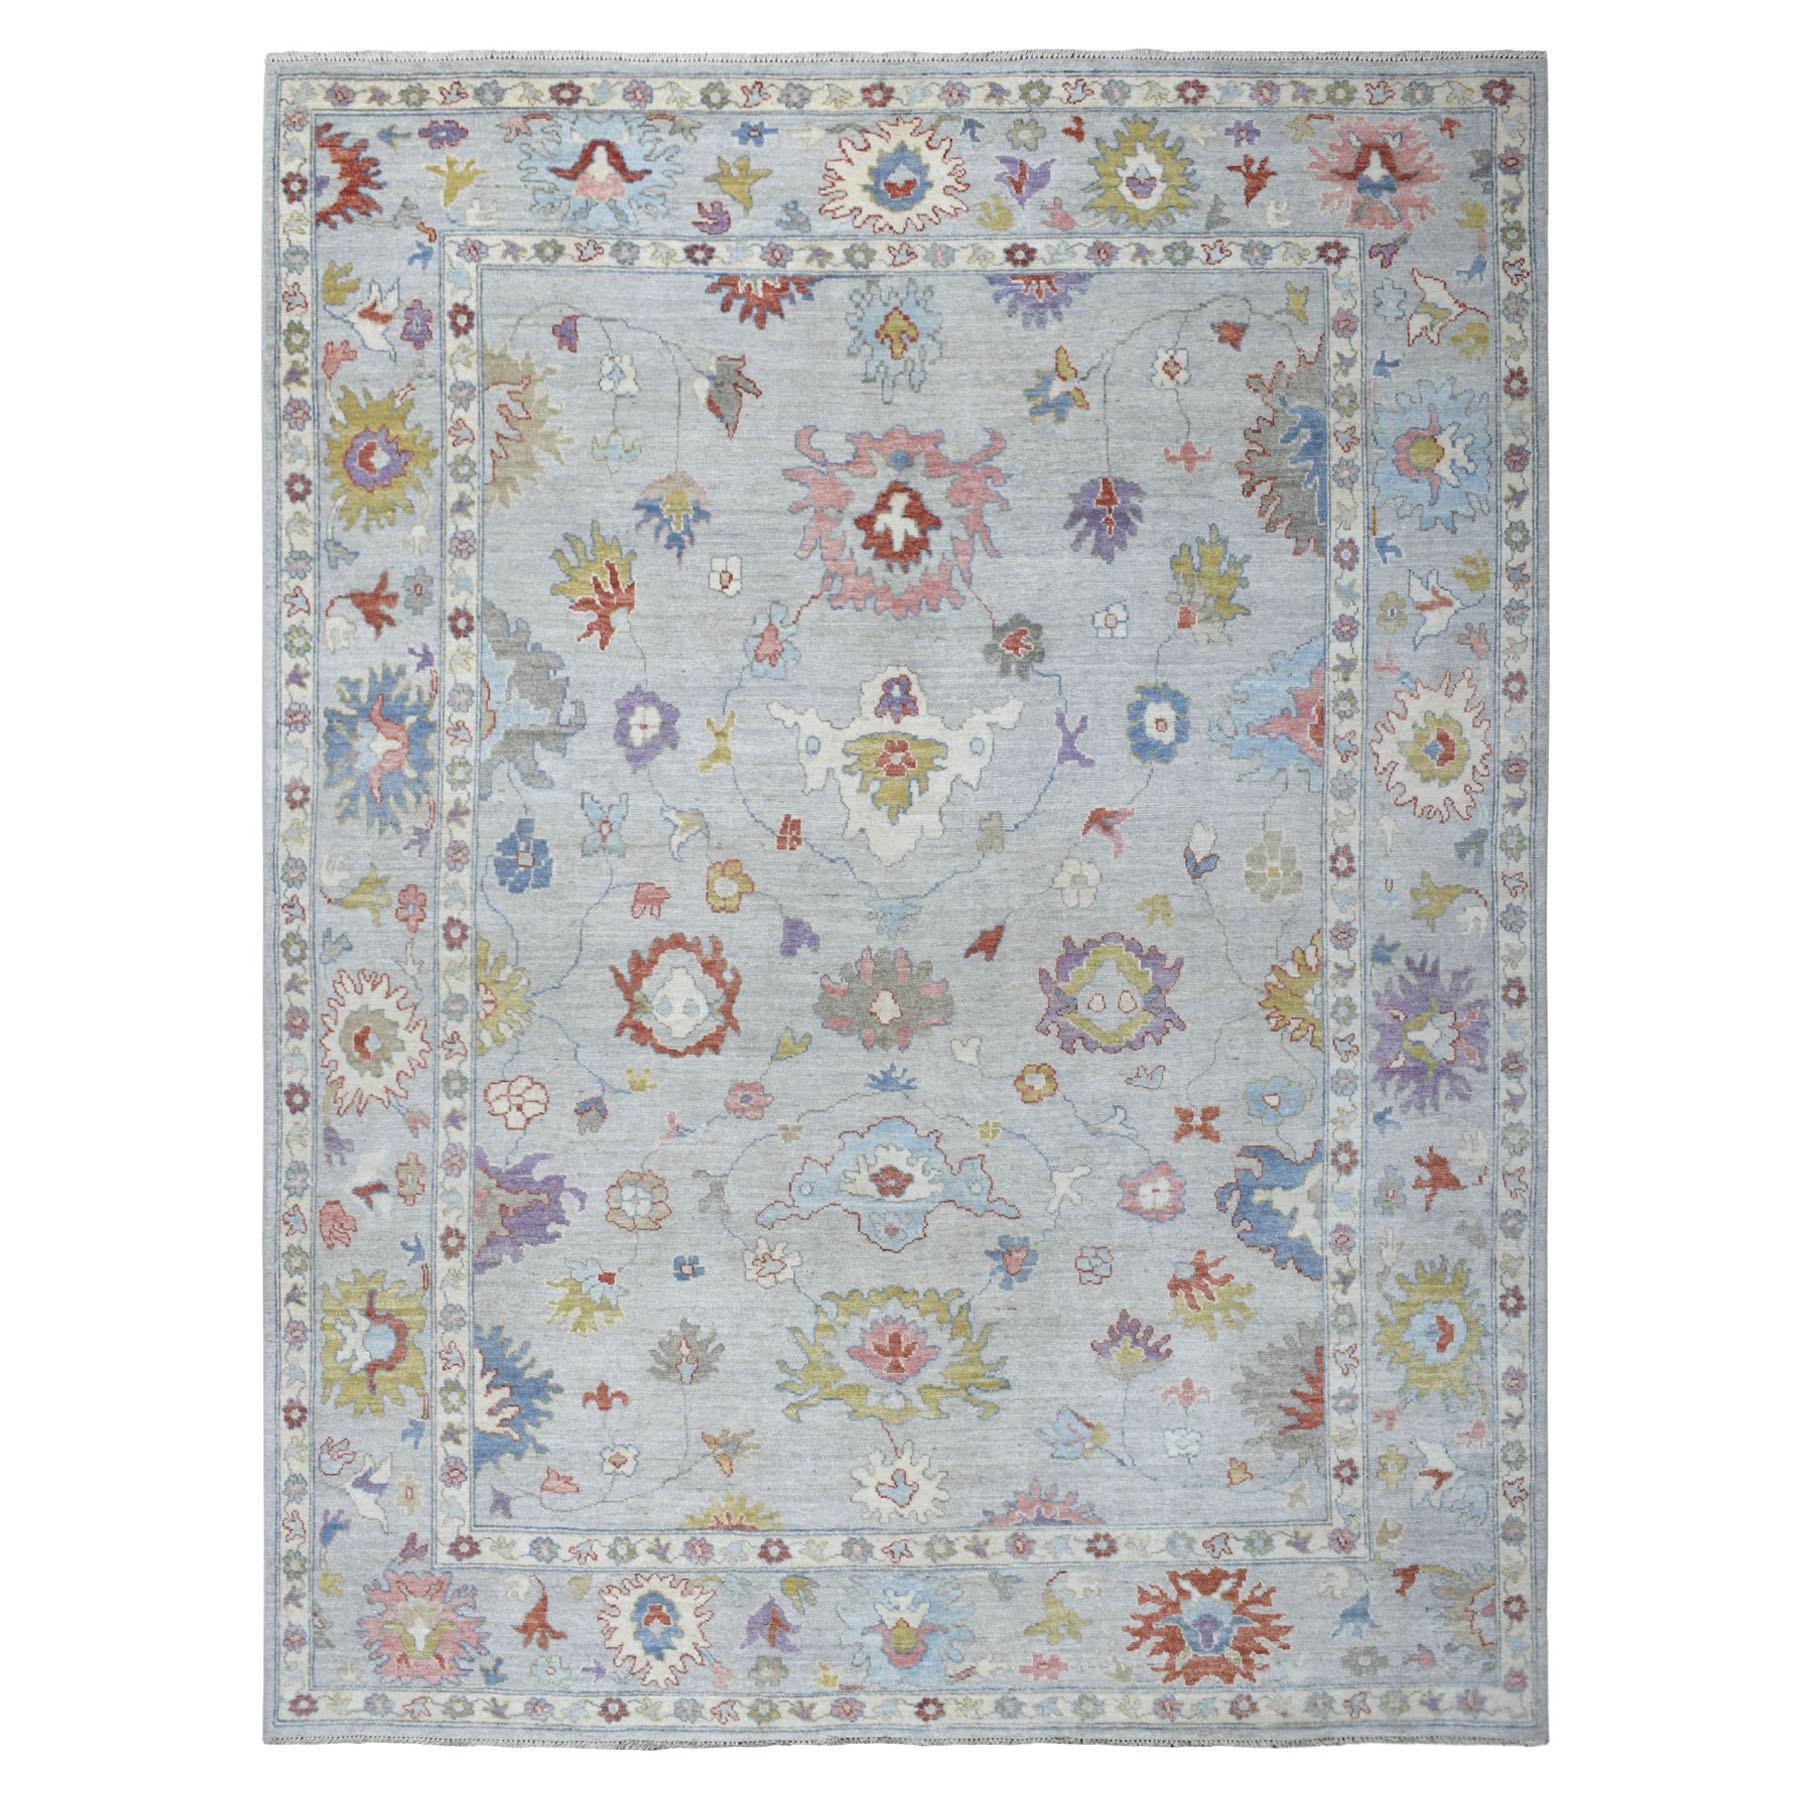 "9'3""x12' Gray Soft Velvety Wool Angora Oushak Hand Knotted Oriental Rug 54567"